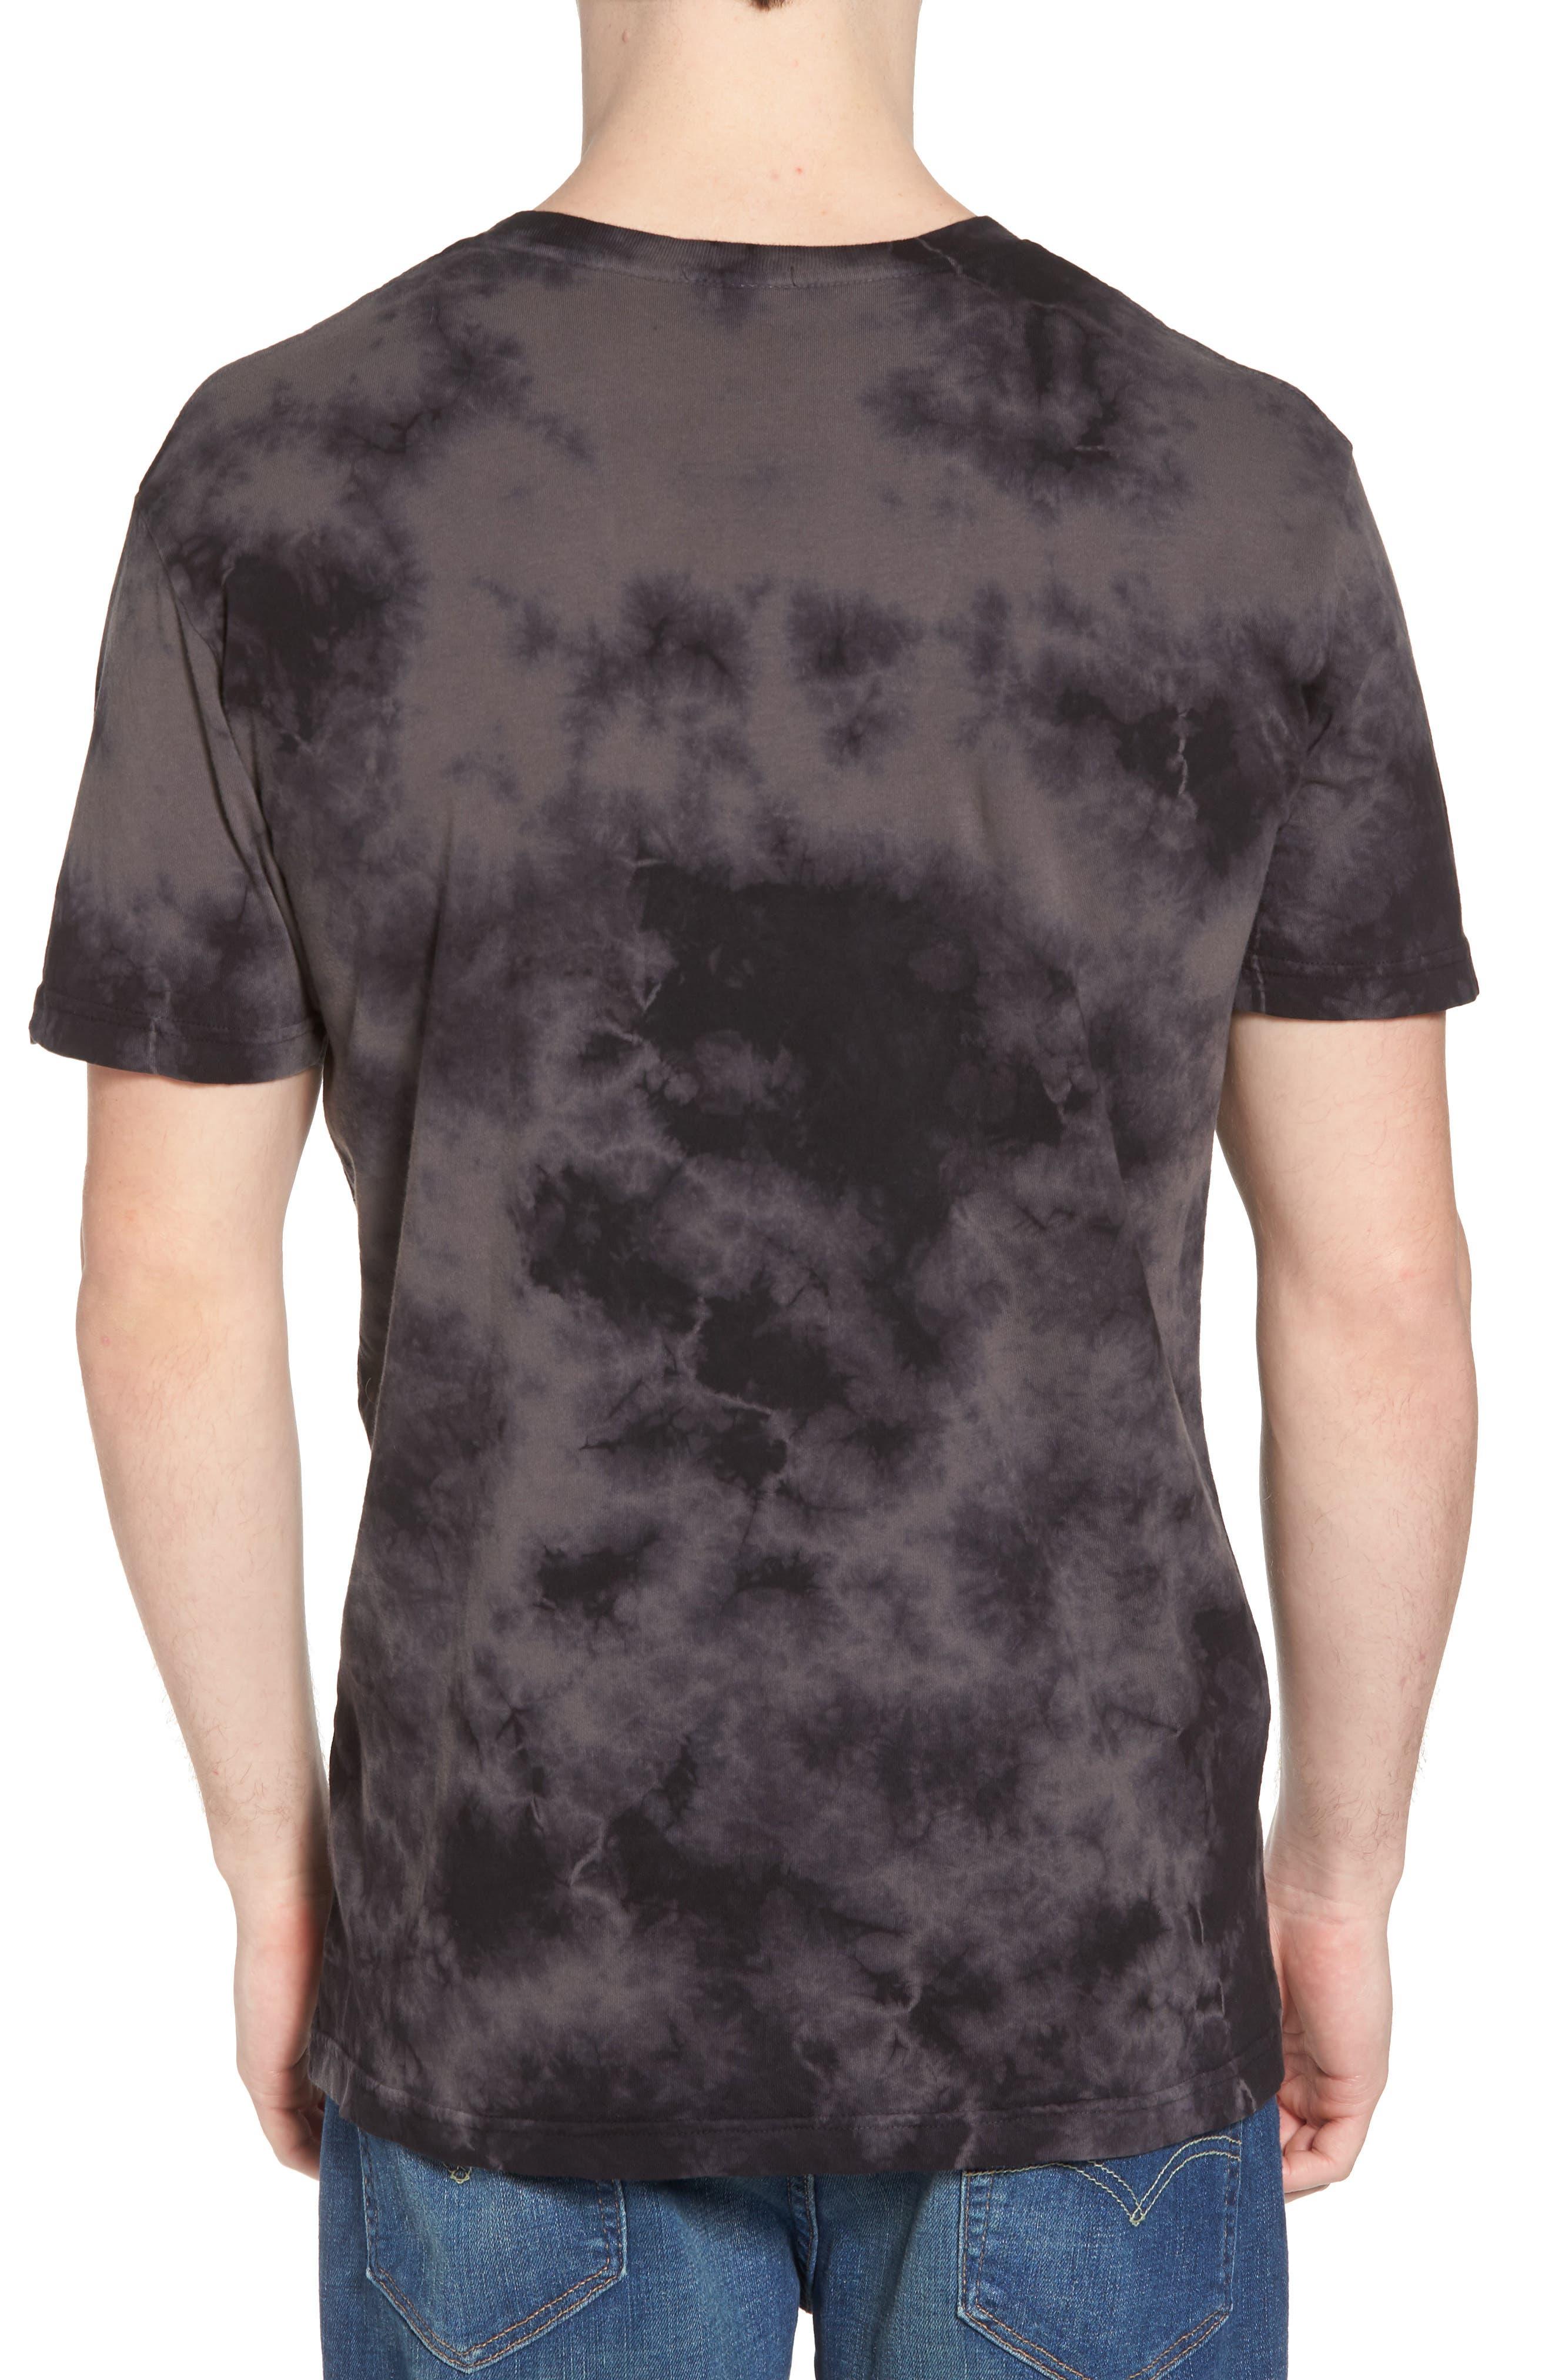 Cult Graphic T-Shirt,                             Alternate thumbnail 2, color,                             Black Wash